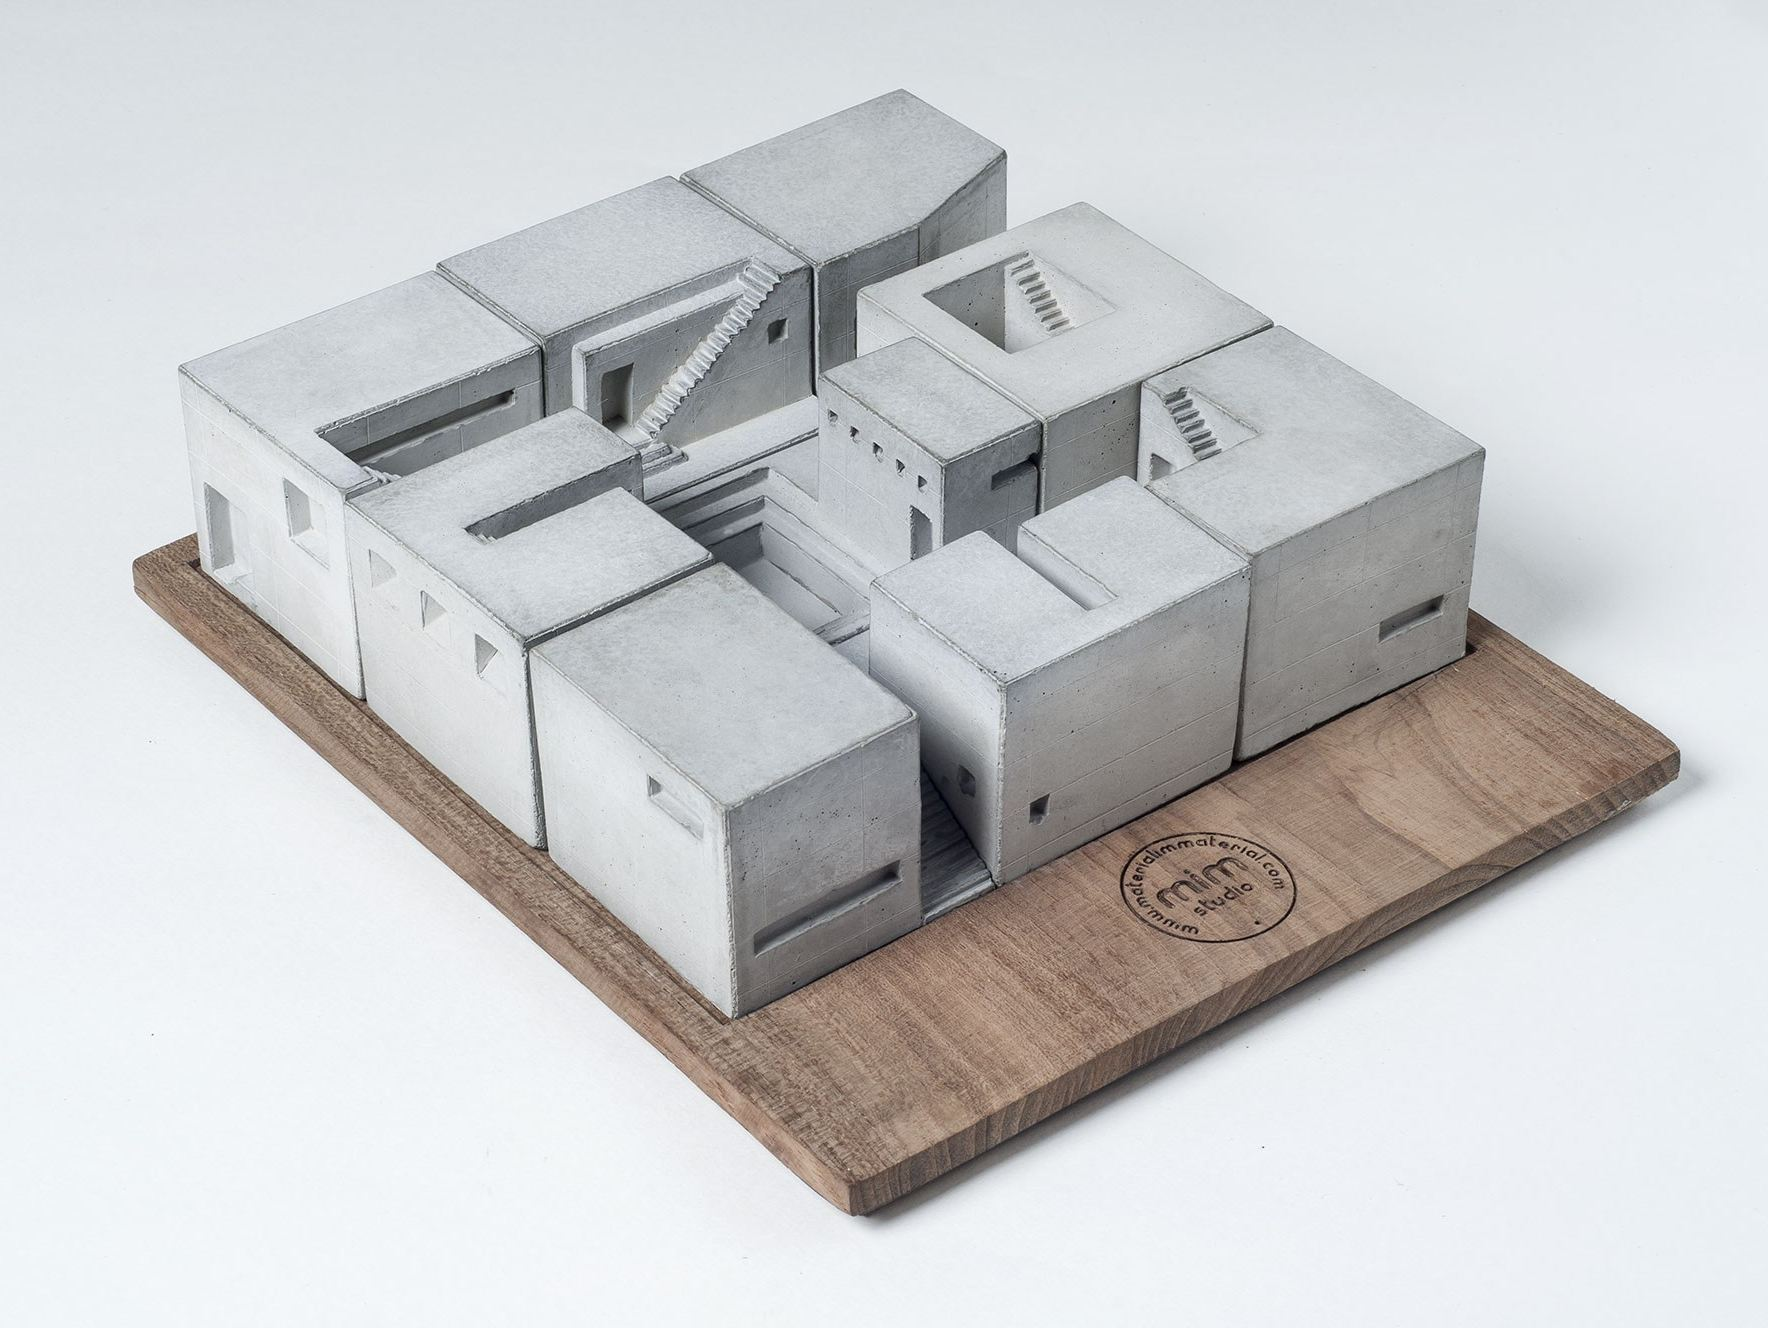 Concrete Architectural Model Miniature Concrete Homes